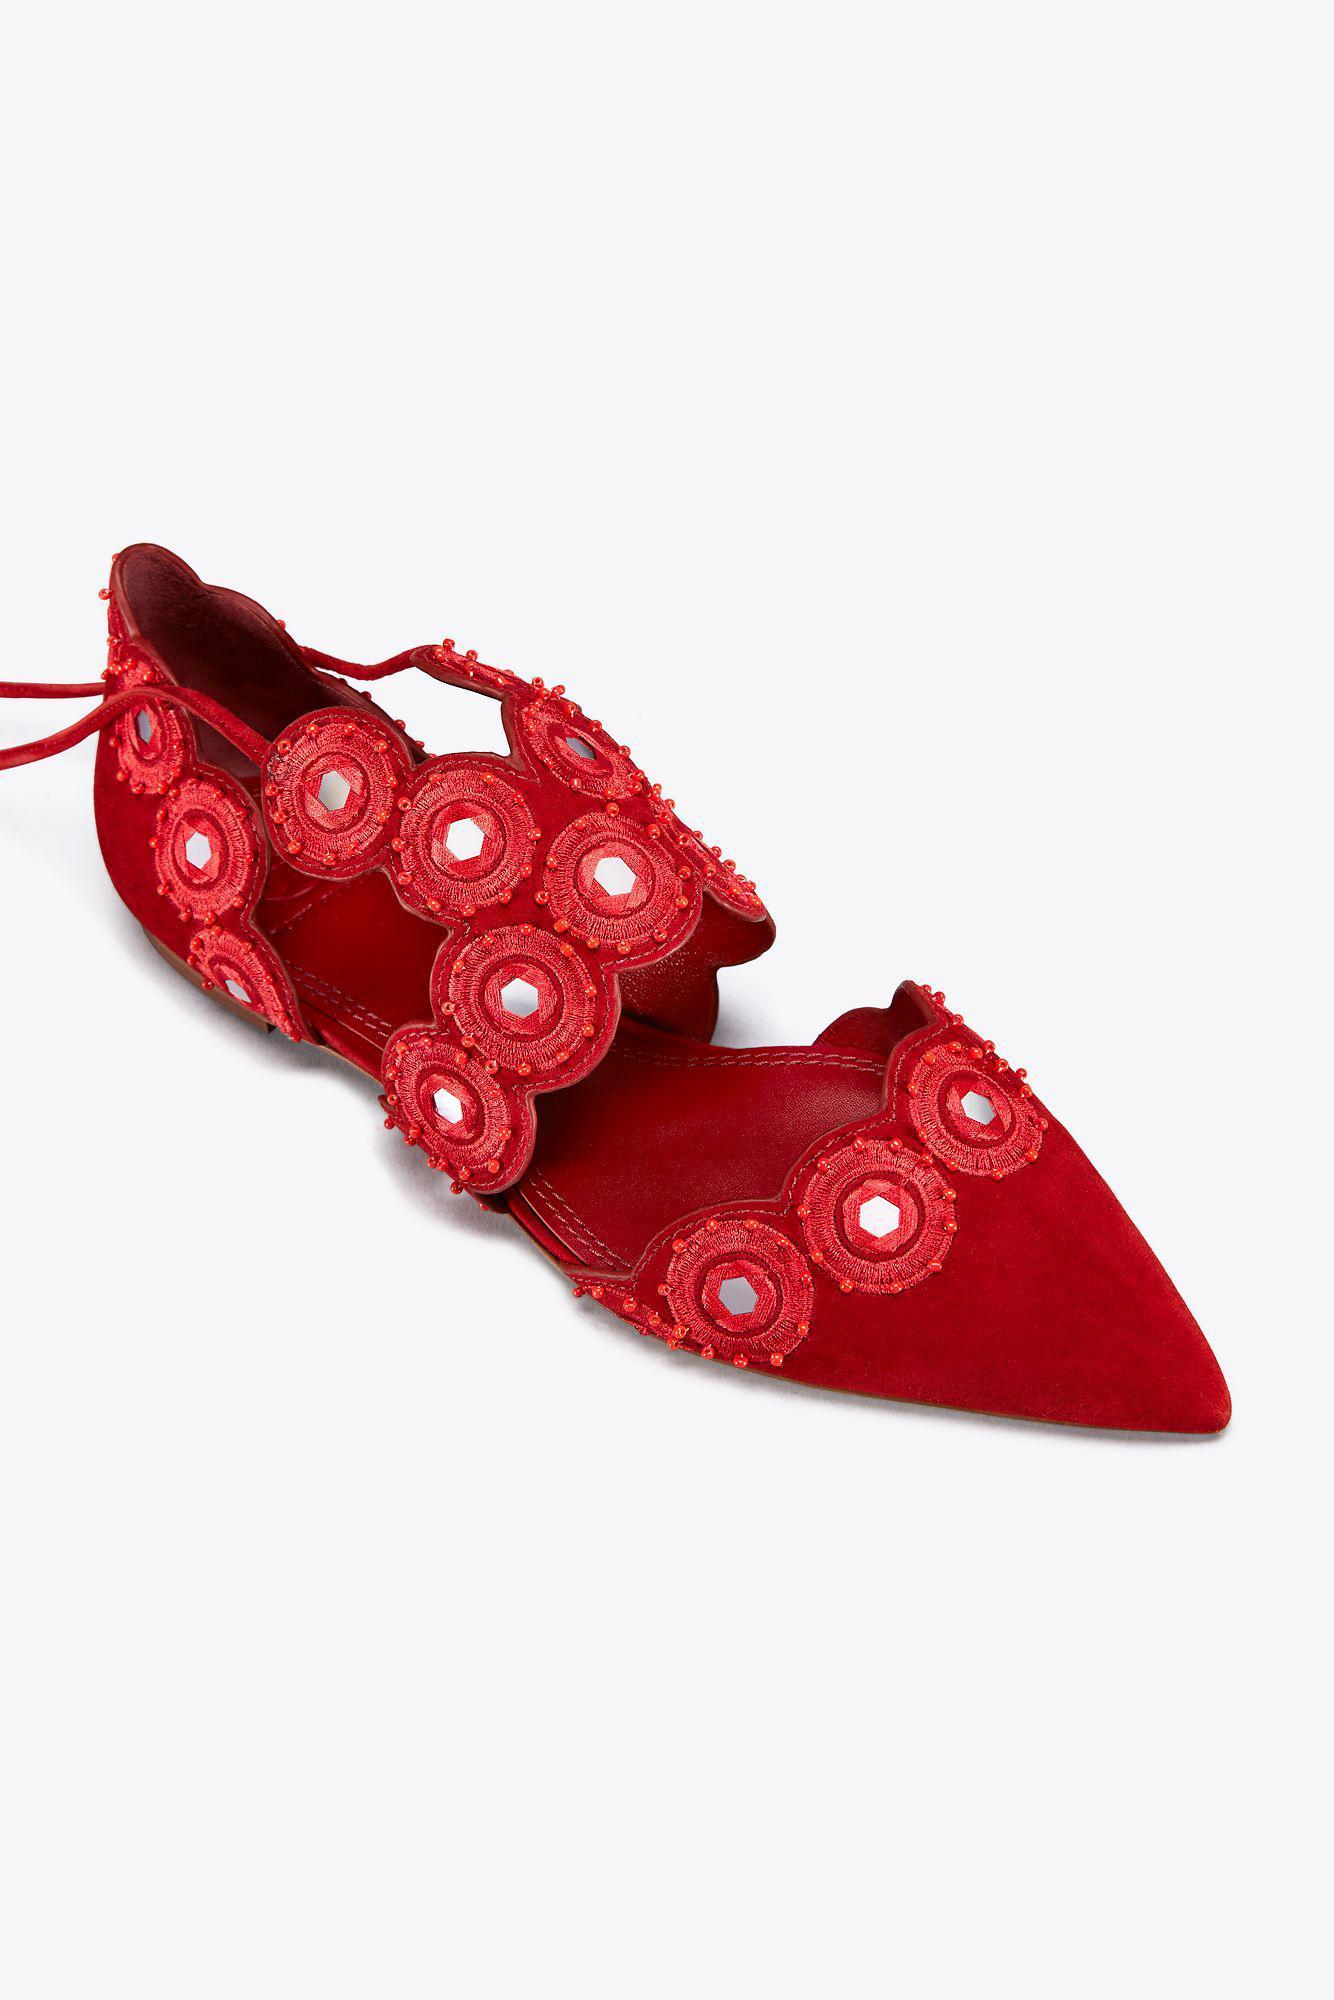 828071c1a26a Lyst - Tory Burch Yasmin D orsay Flat in Red